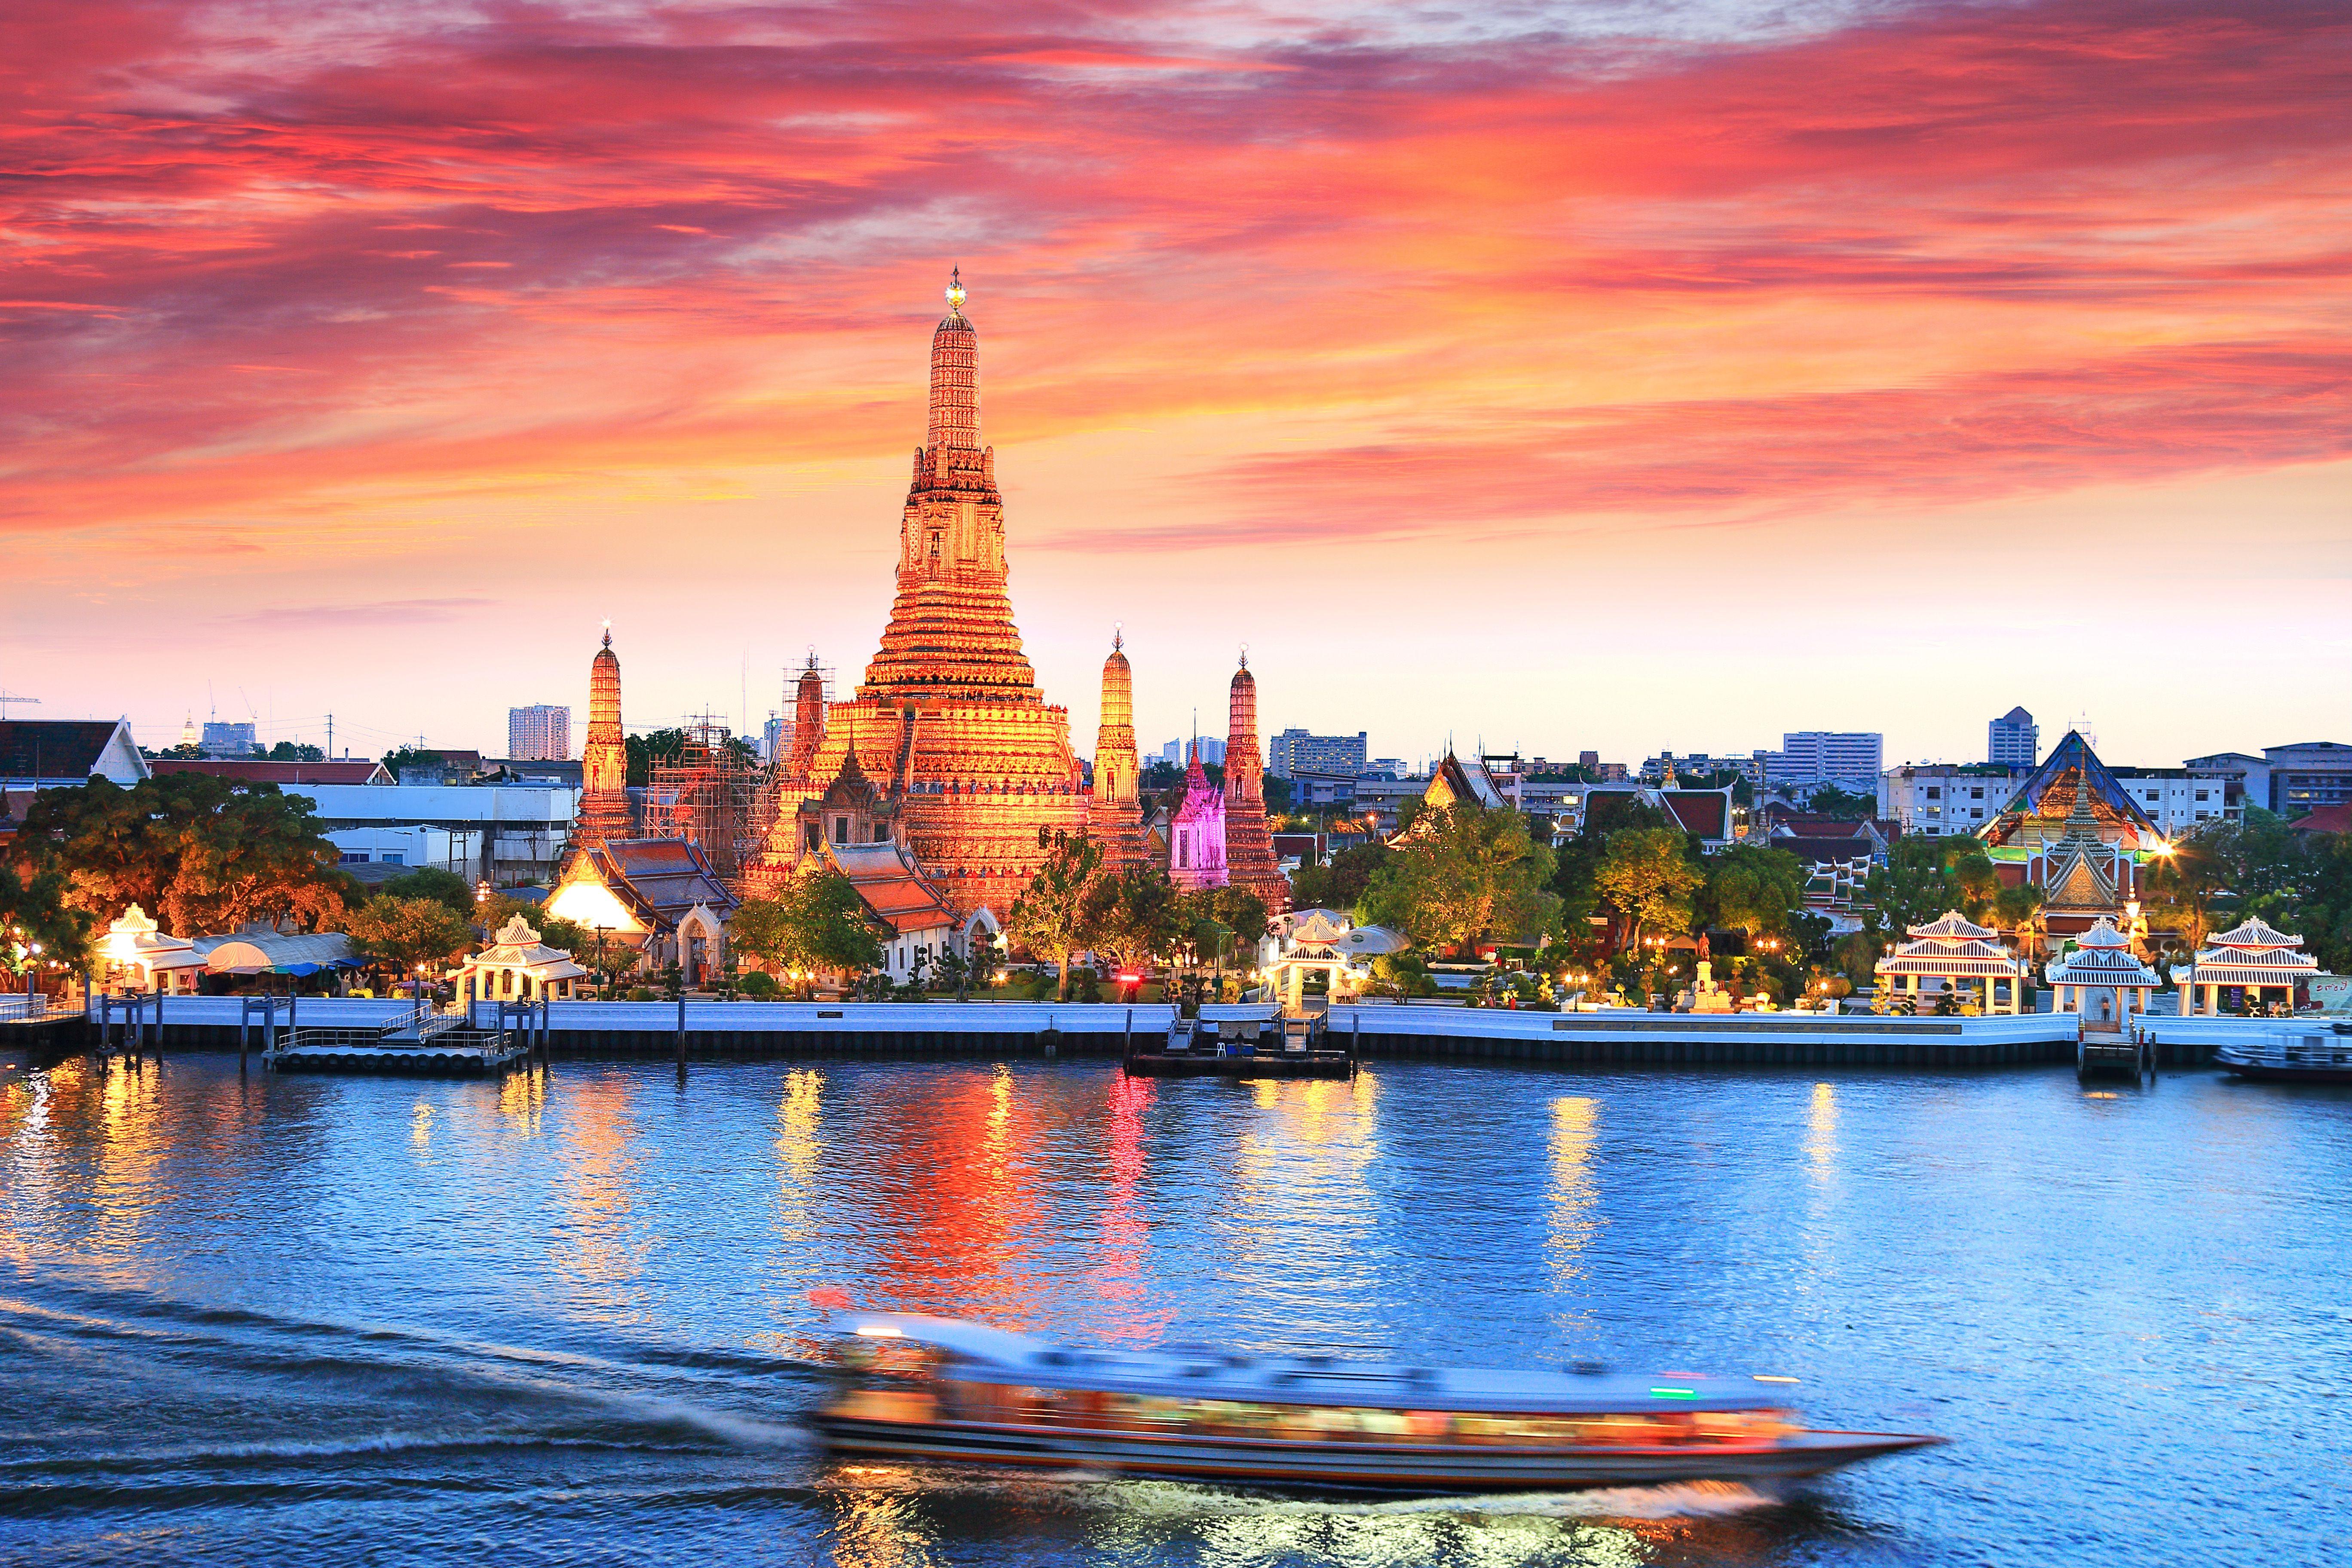 Wat Arun on the Chao Phraya River in Bangkok